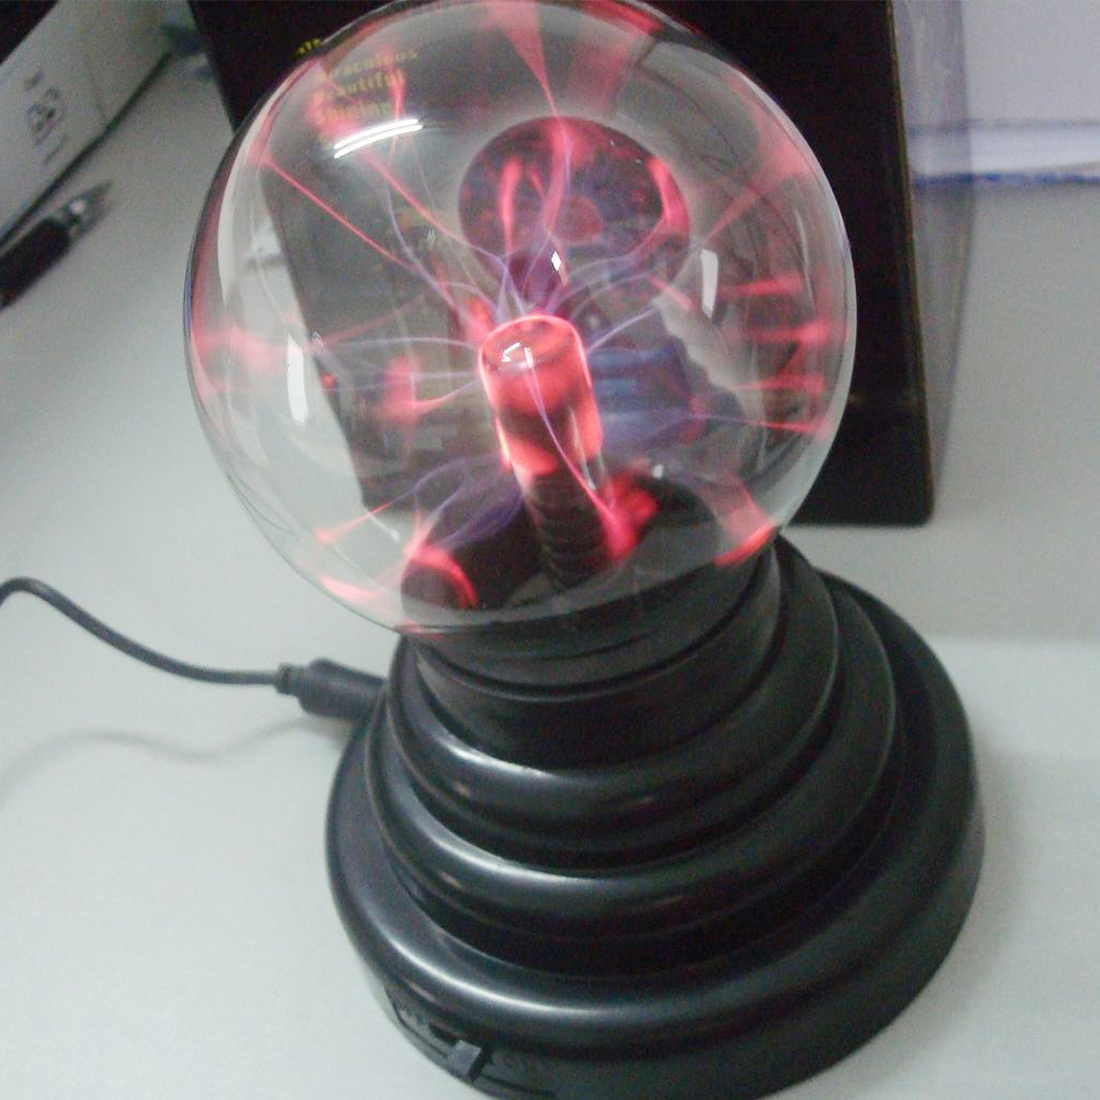 Lava Lamp Box Lightning Lamp Magic Plasma Ball Retro Light 3 Inch Kids Christmas Party Cristal Gift Room Decoration Light